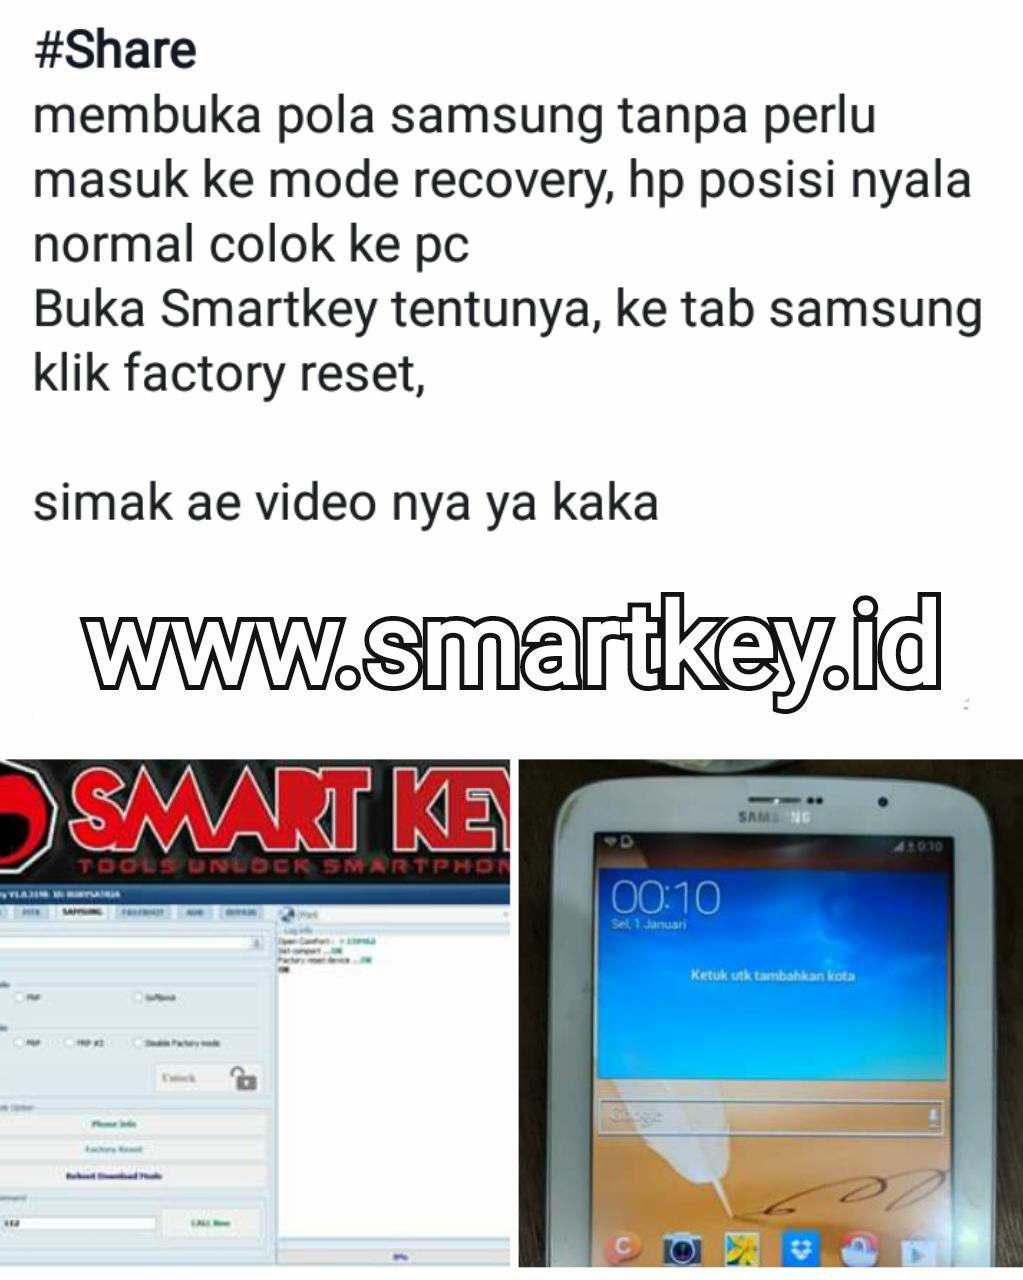 smartkey-017.jpg (1023×1280)